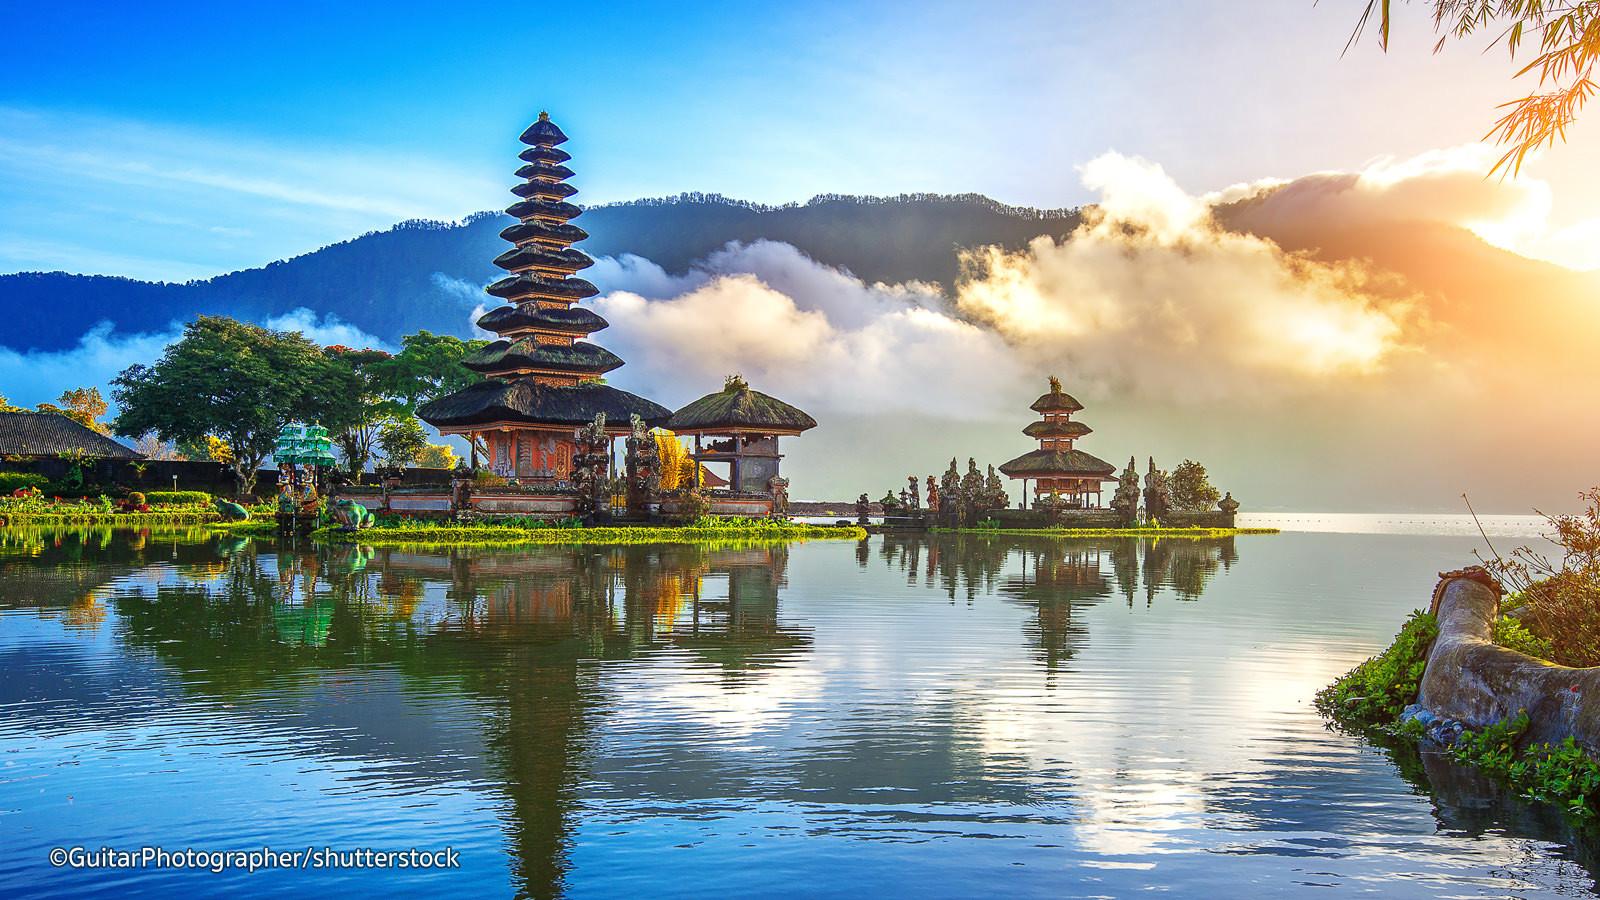 peaceful serene temple